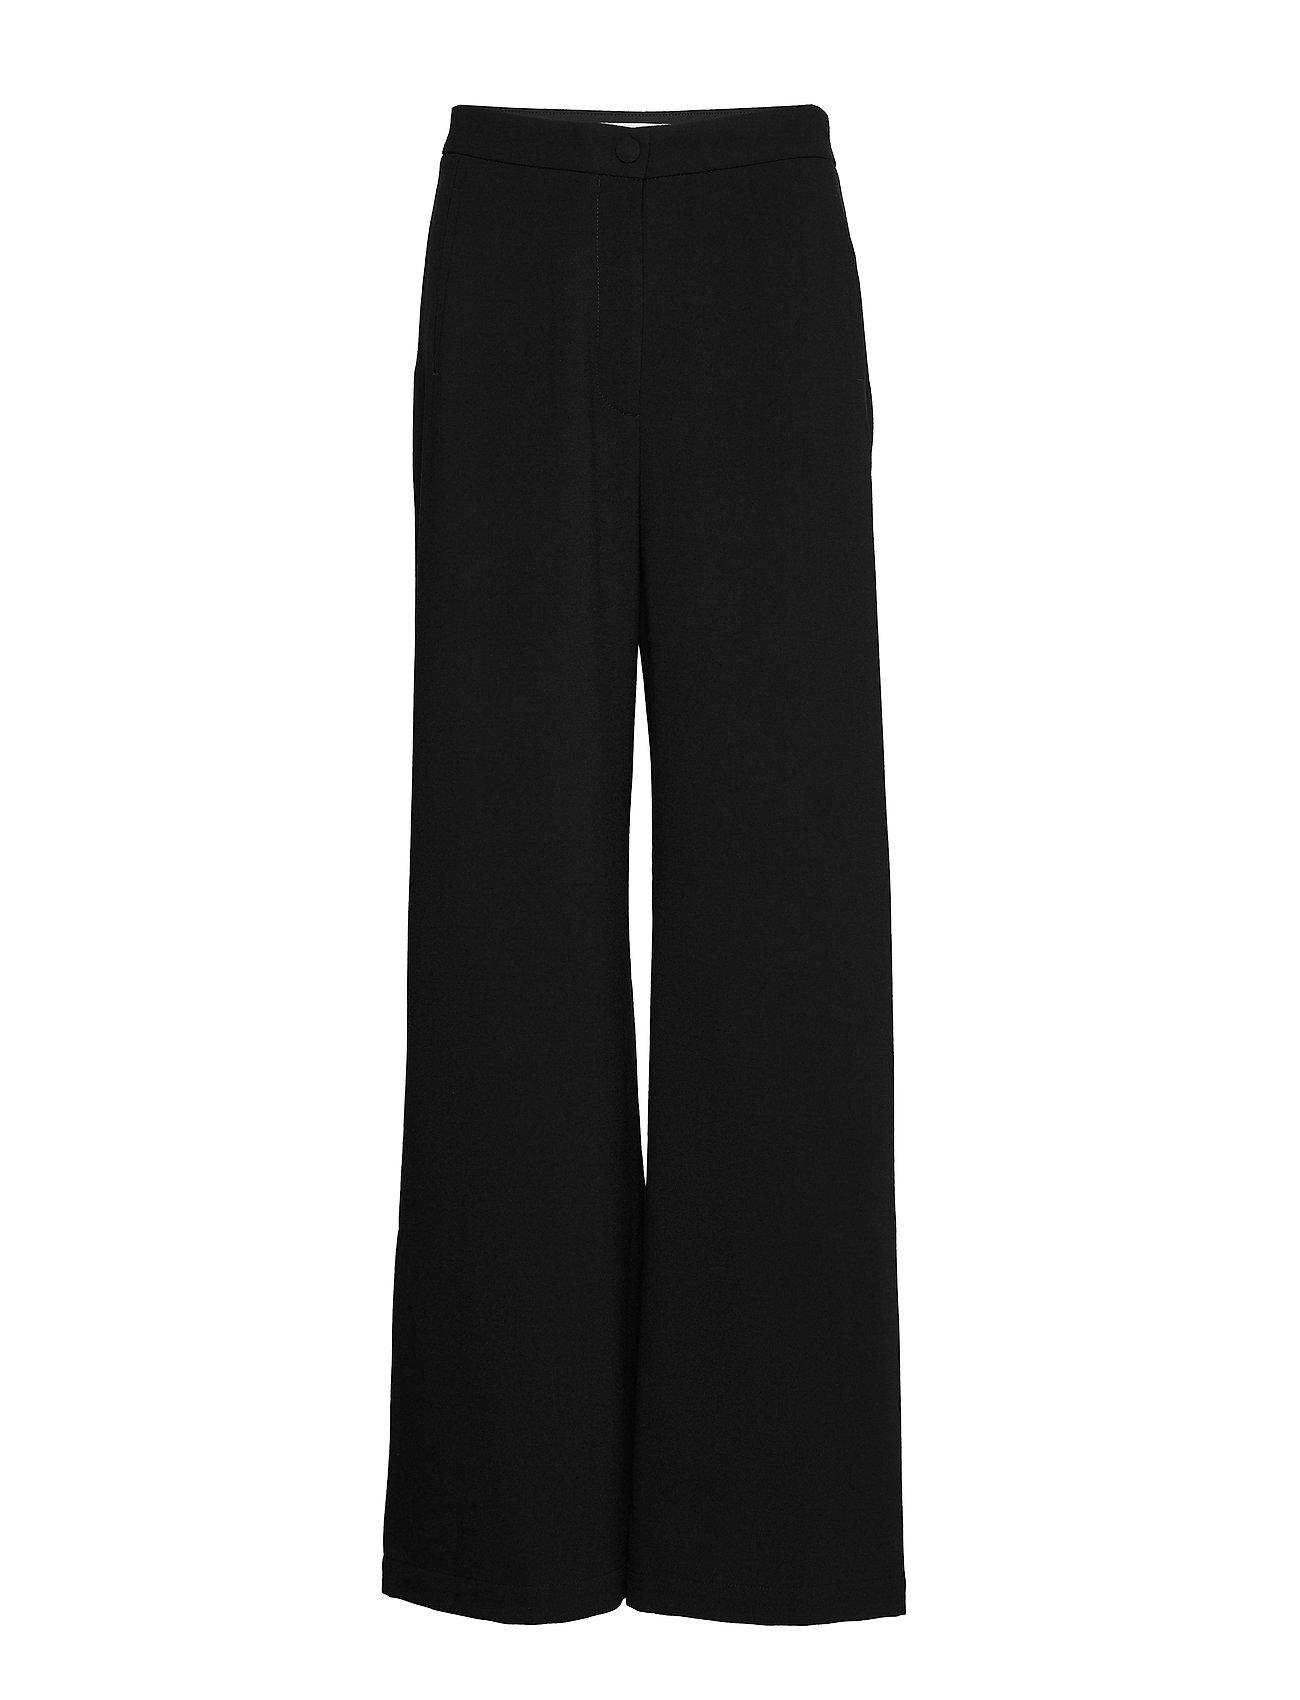 RODEBJER - SINI - bukser med brede ben - black - 0